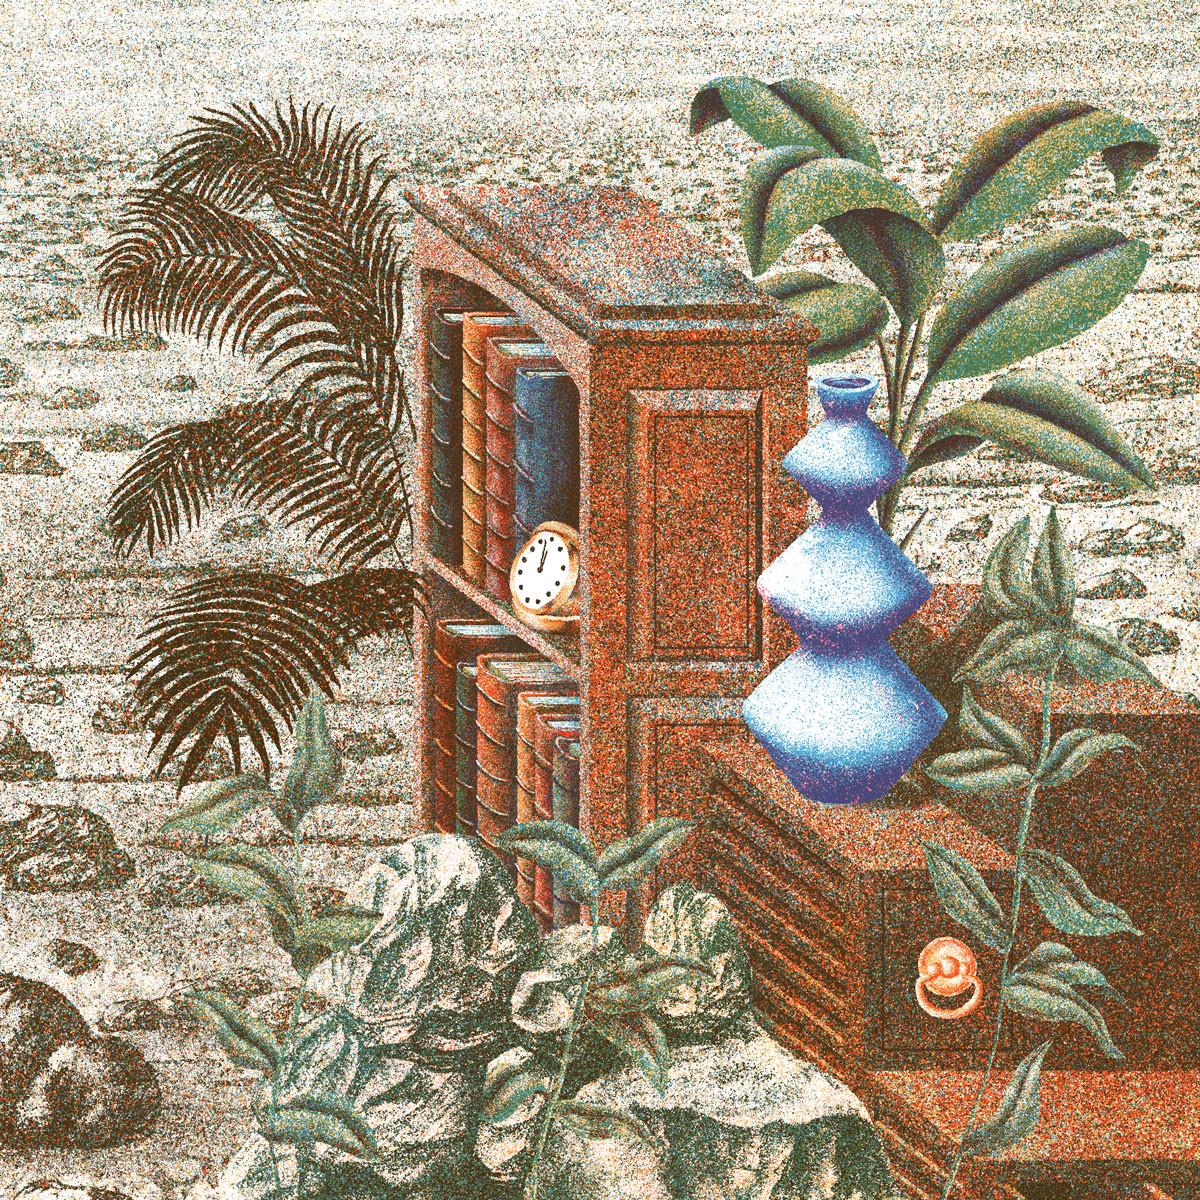 Fantast-Bookshelf1200-60.jpg